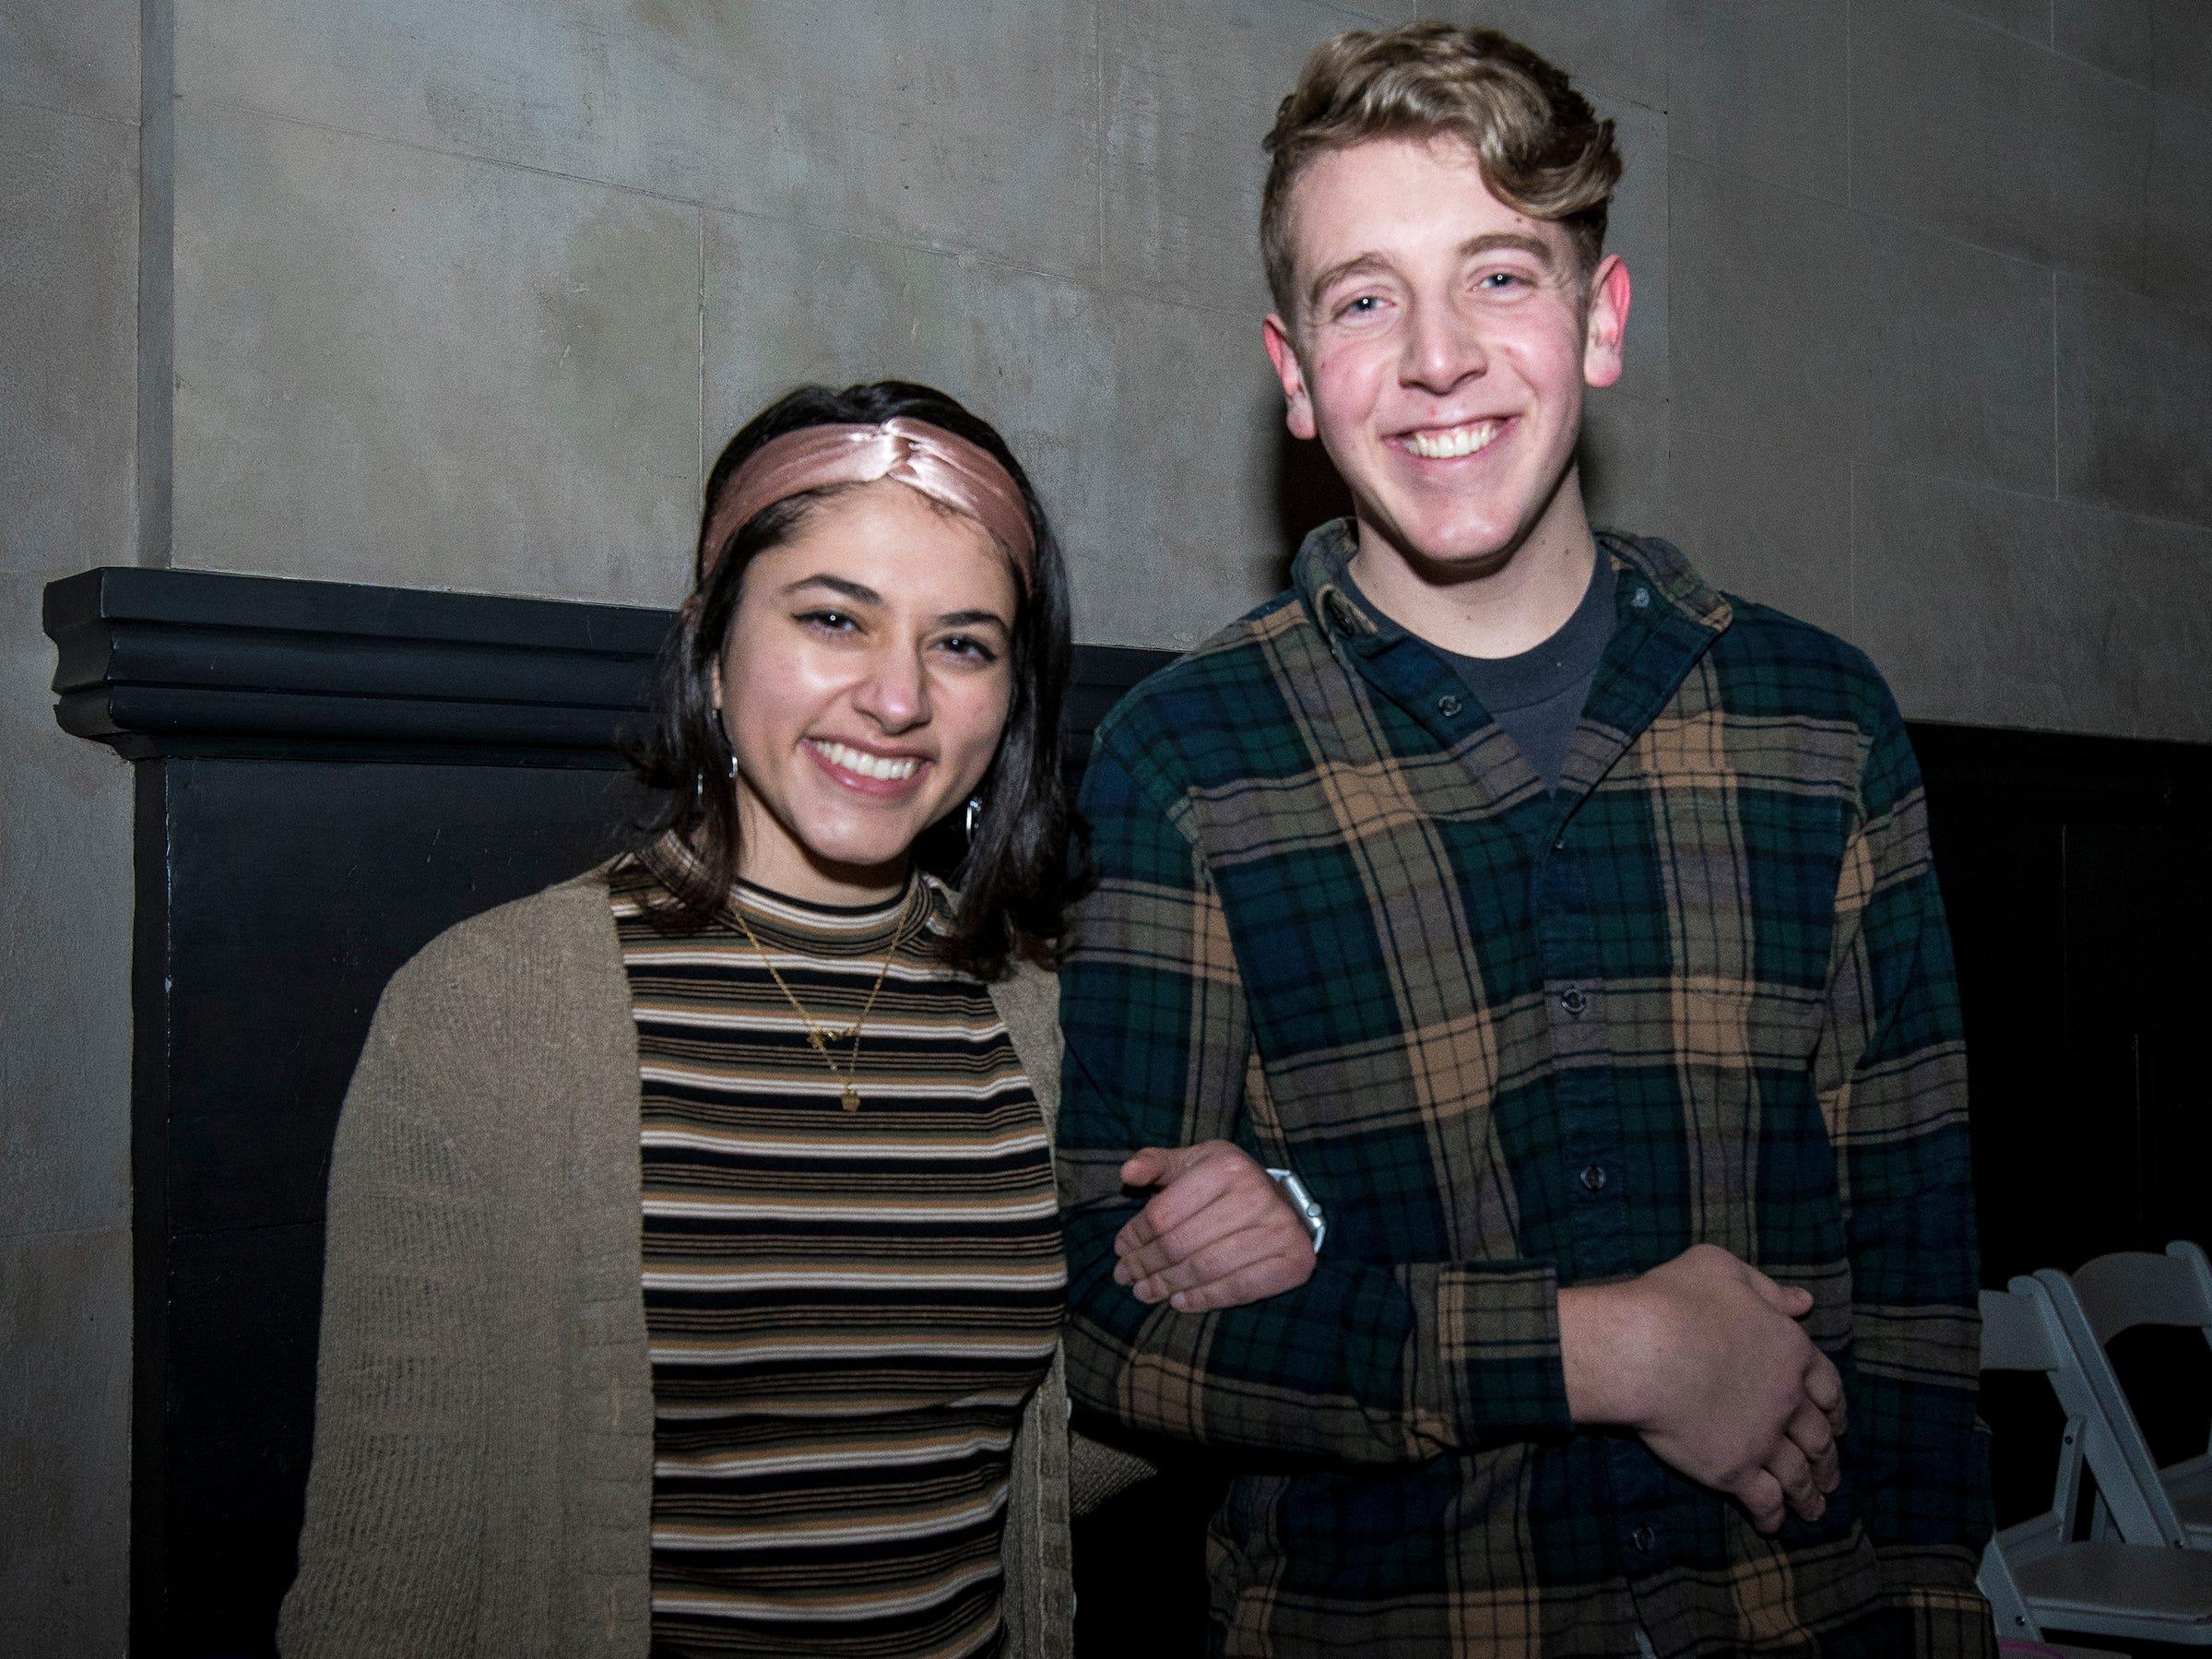 Shivane Chawla and Nic Arnett attend a 90s-themed silent disco during Art After Dark at the Cincinnati Art Museum Friday, January 25, 2019 in Cincinnati, Ohio.